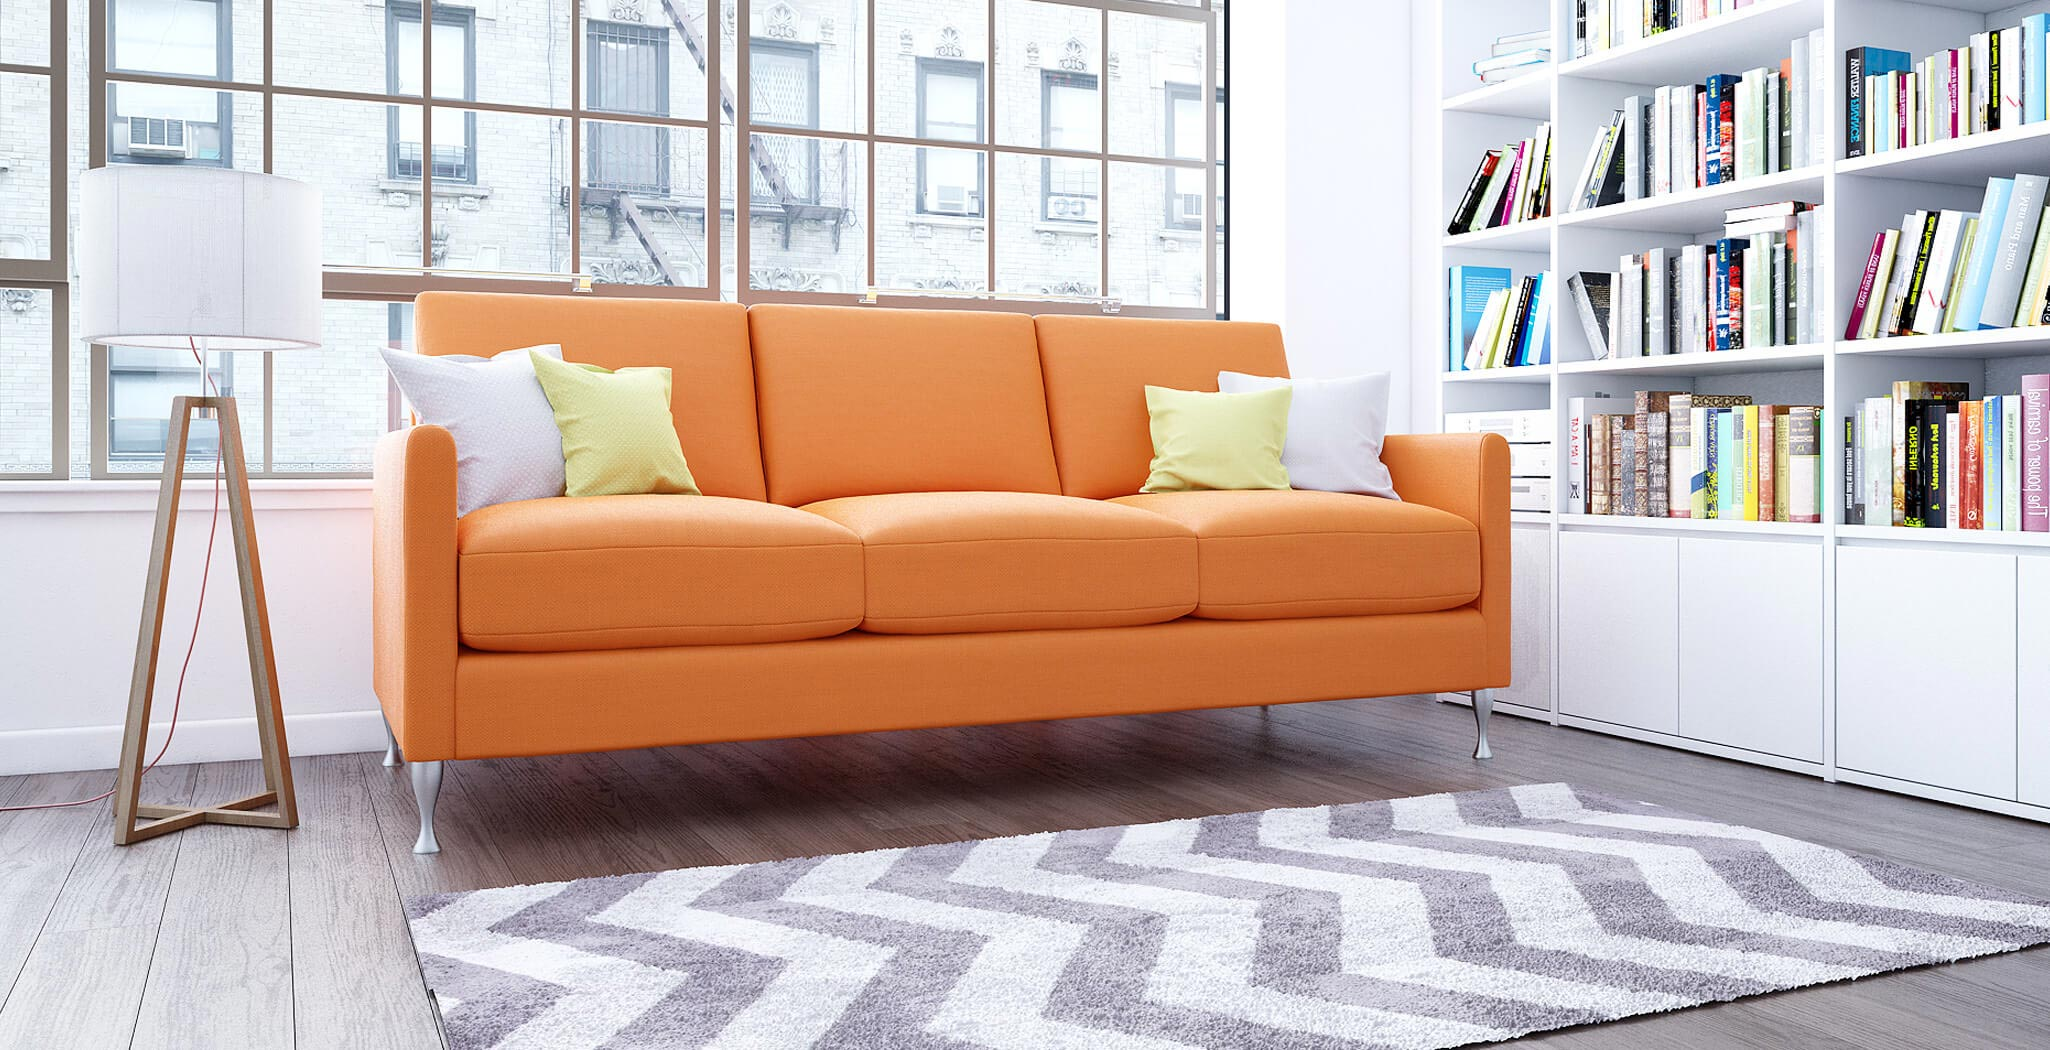 eureka sofa furniture gallery 1